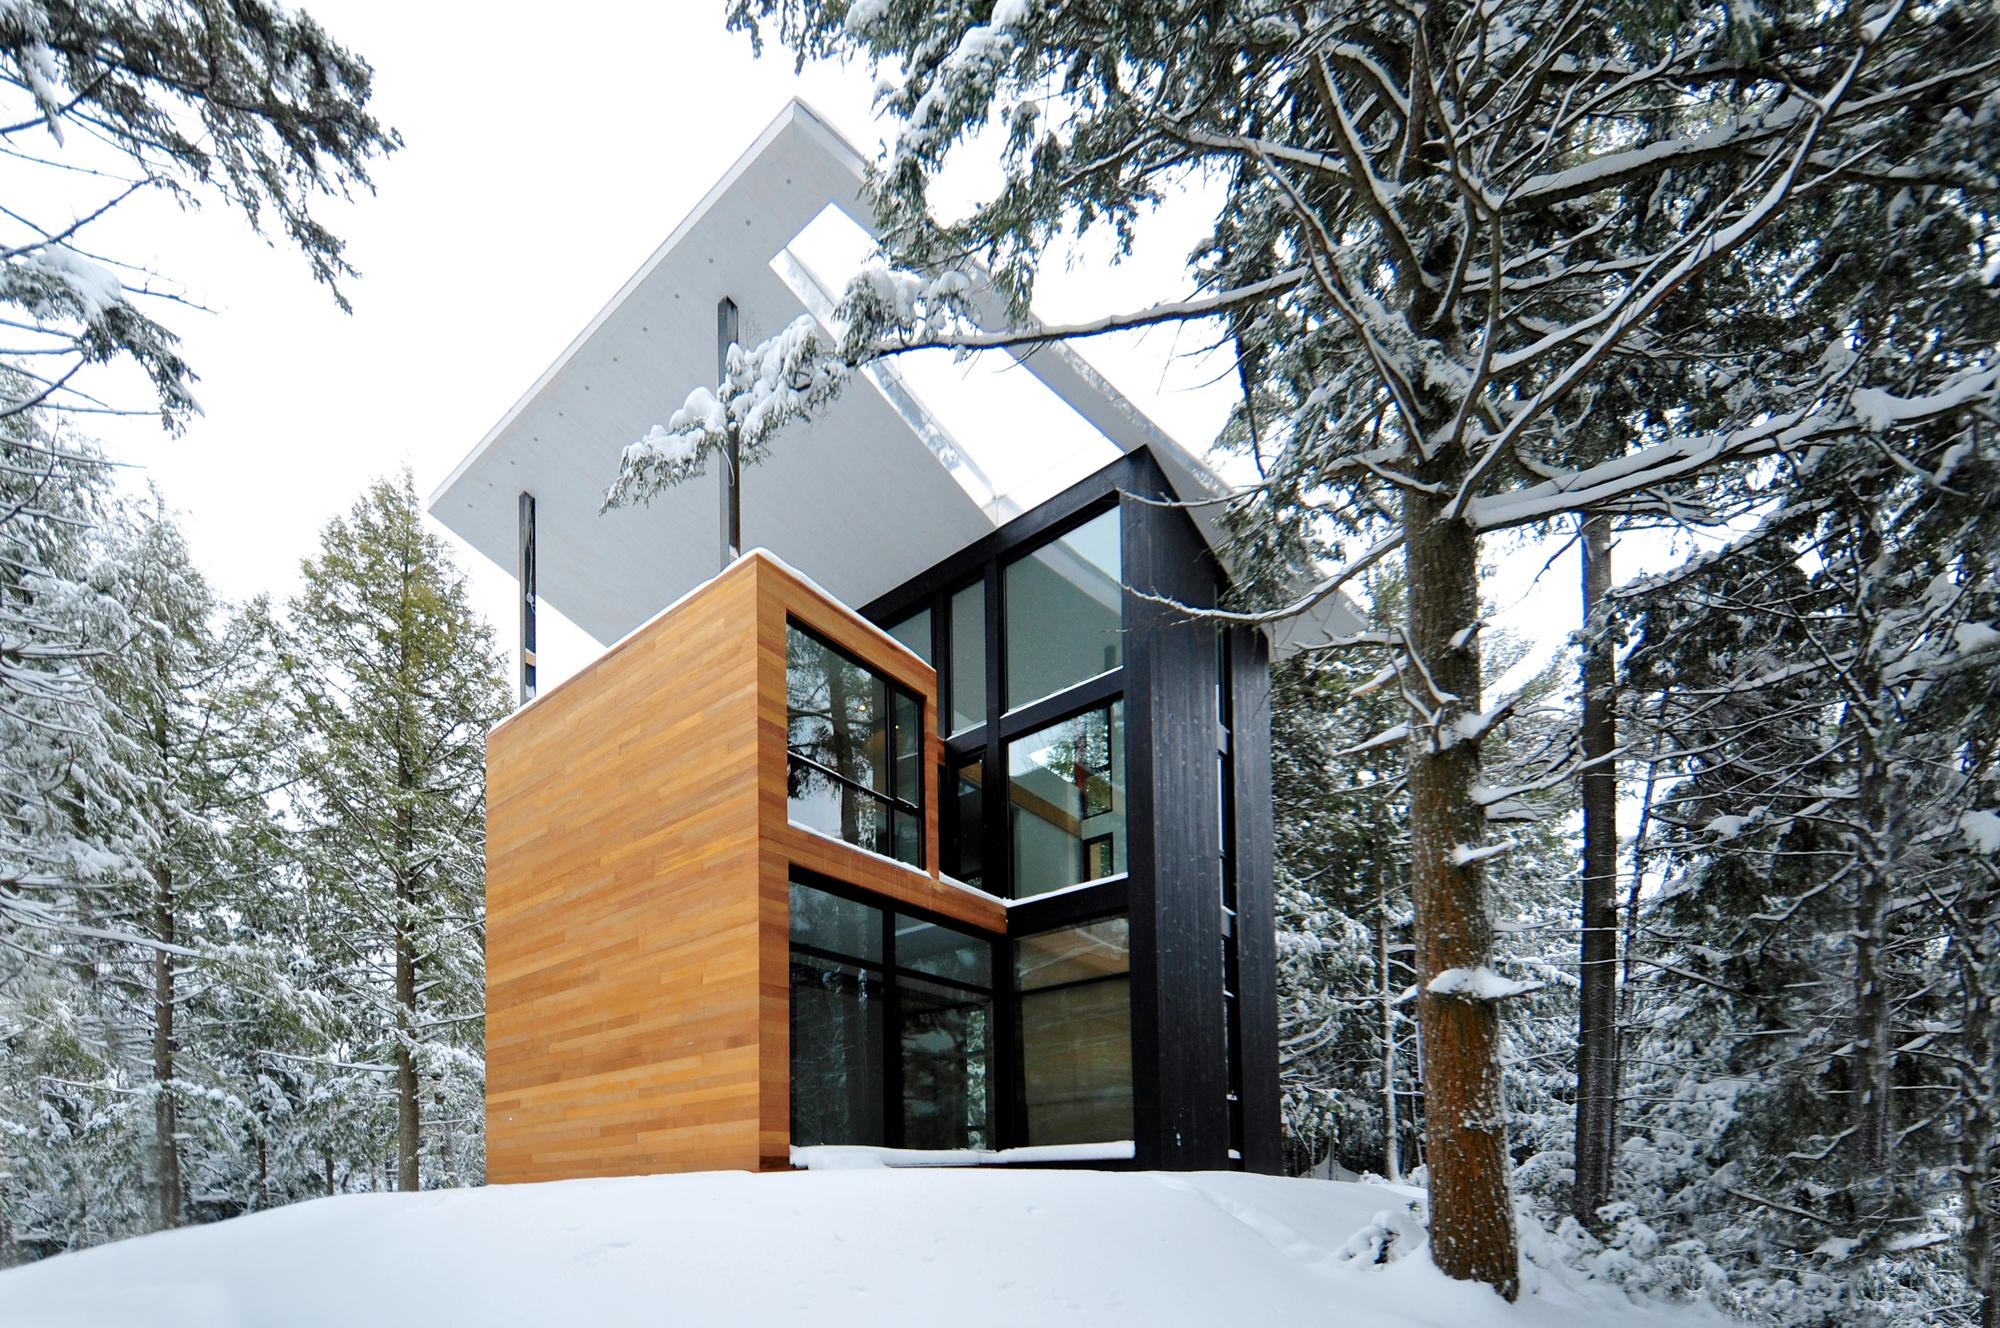 La casa del escultor Jarnuszkiewicz / yh2